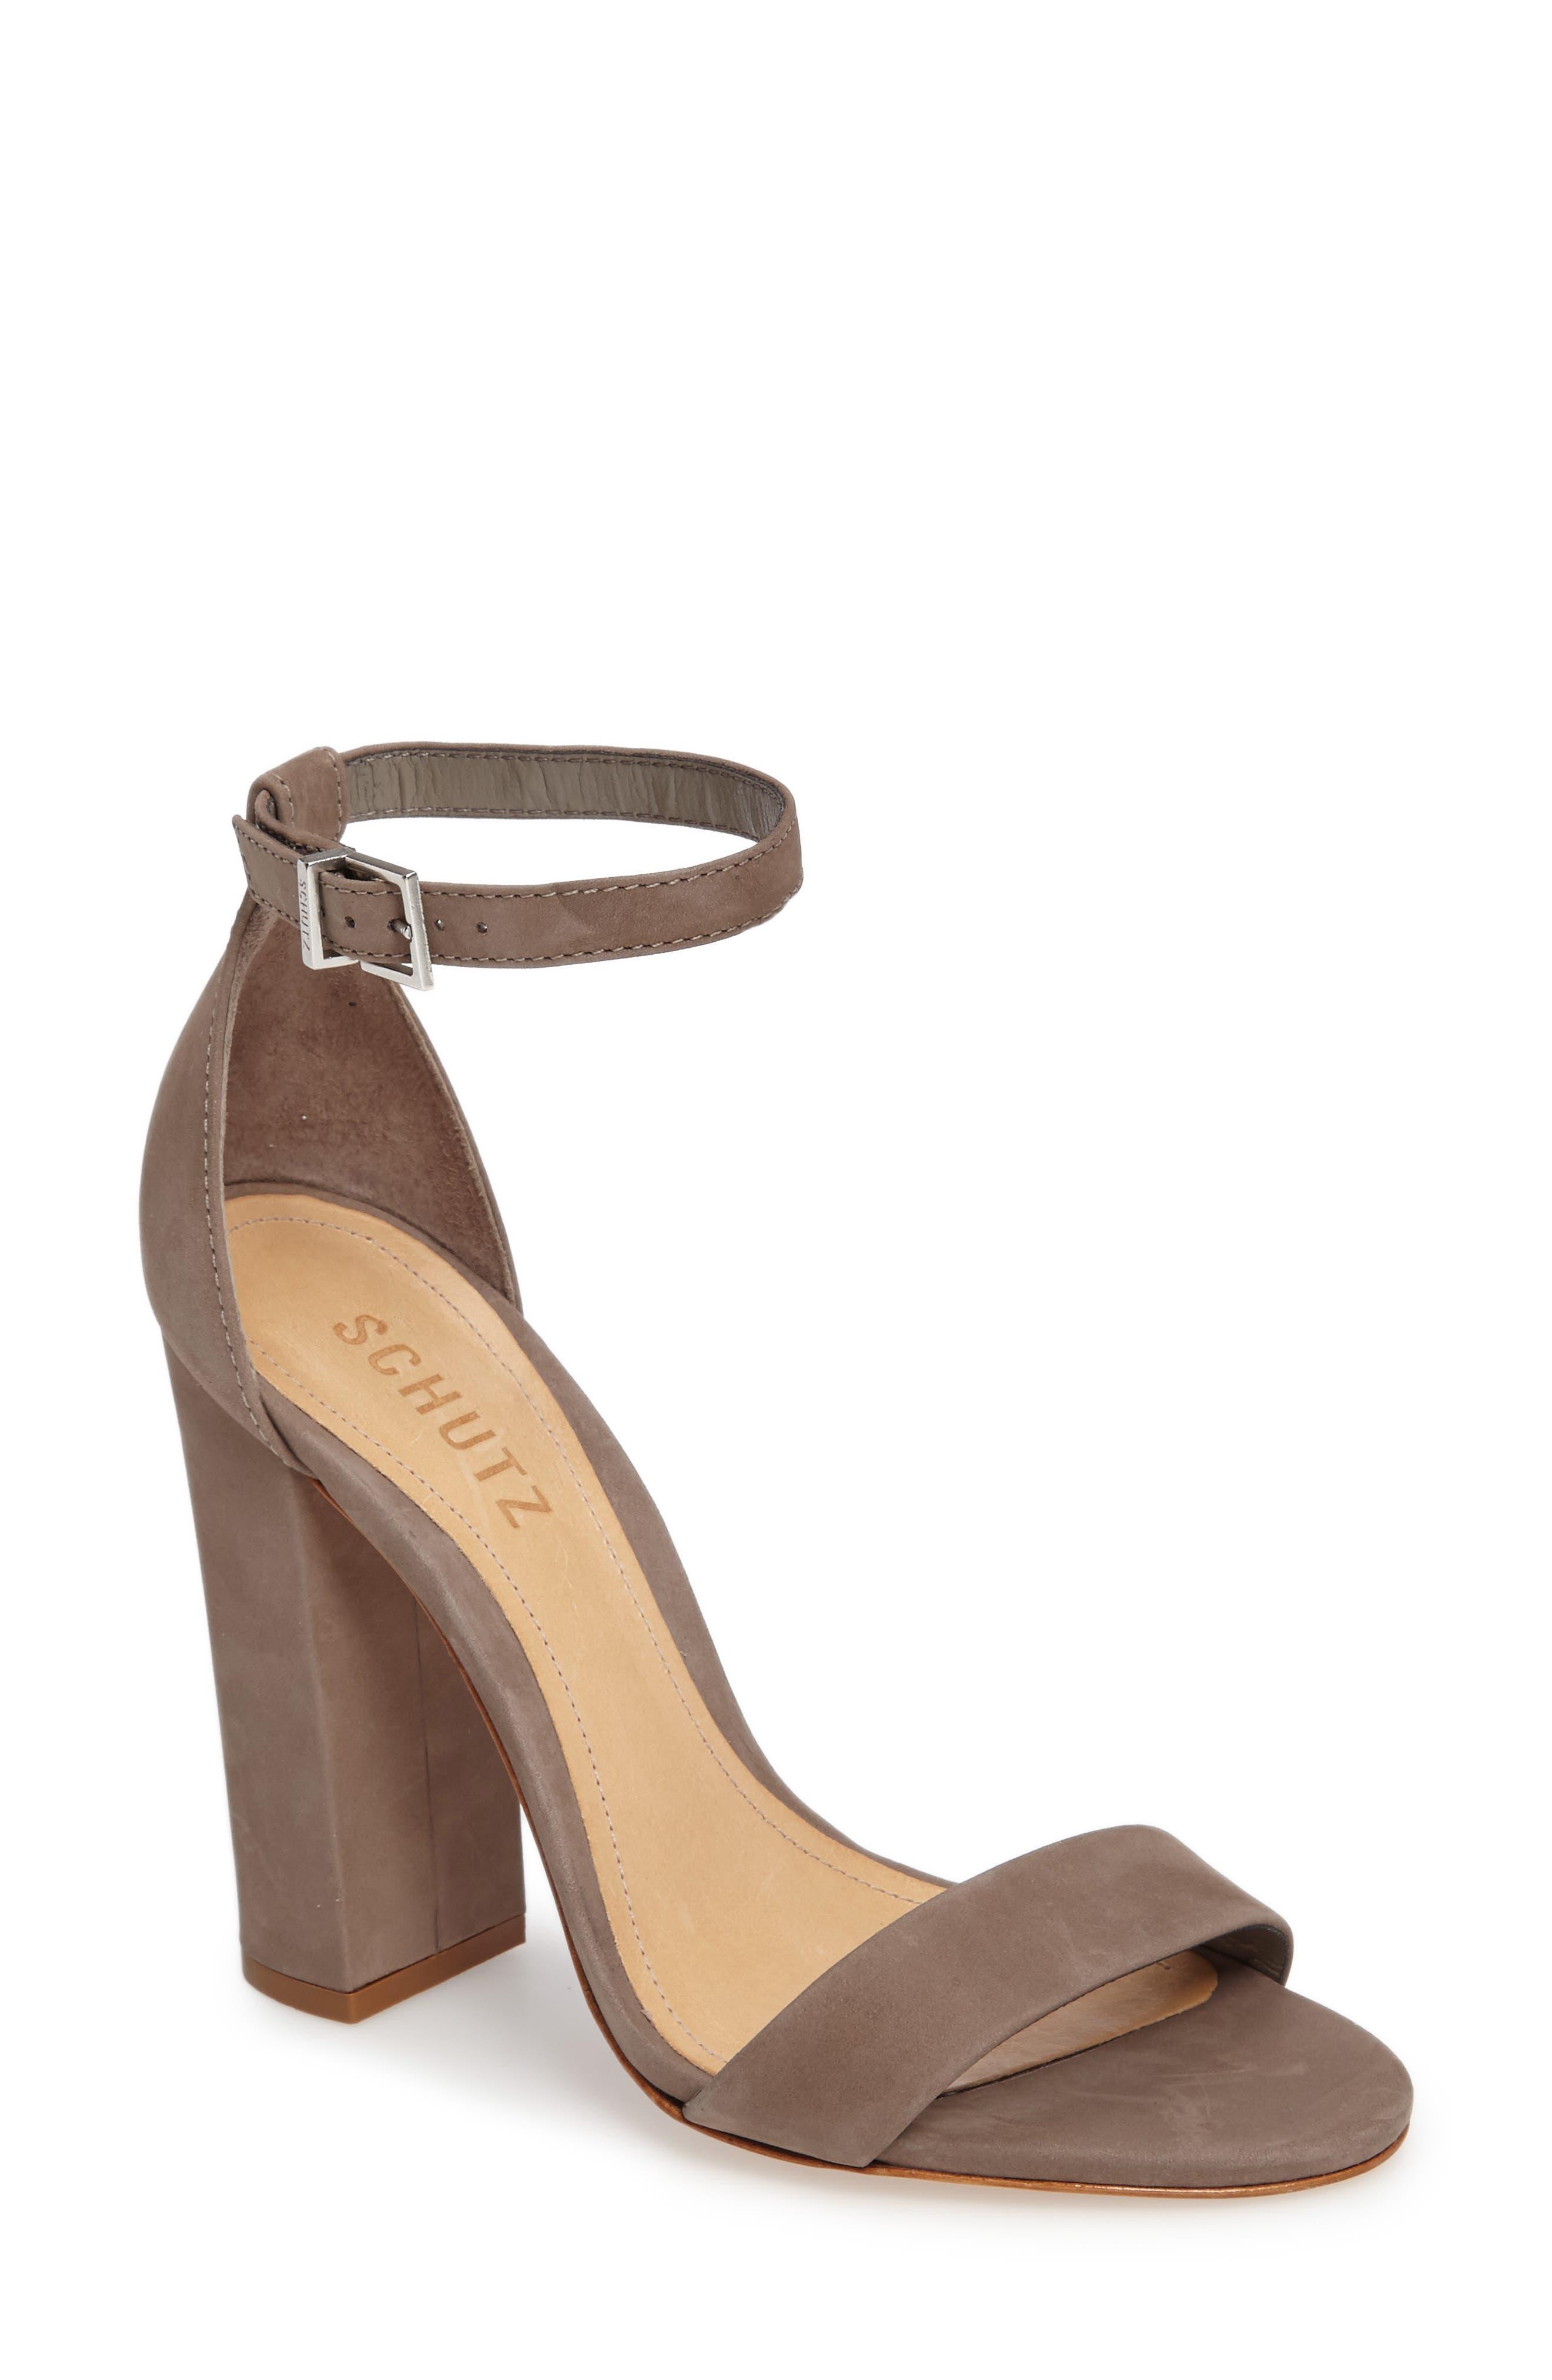 Enida Sandal,                         Main,                         color, Mouse Nubuck Leather